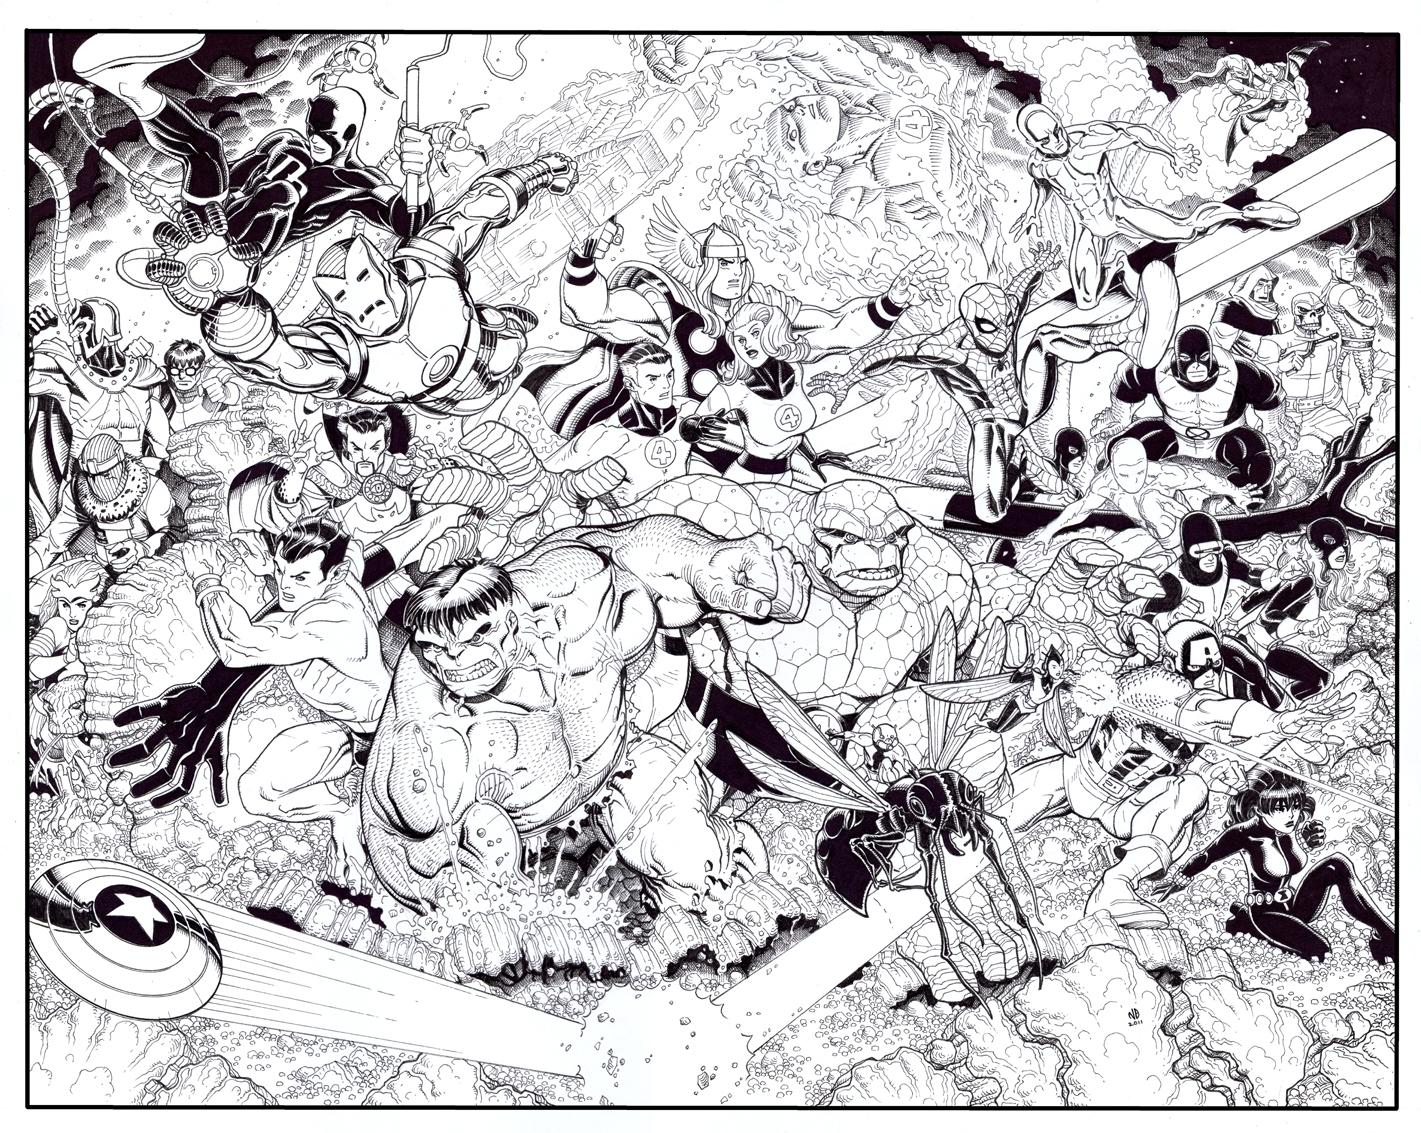 Nick bradshaw -marvel universe poster art spider man avengers x men ff comic